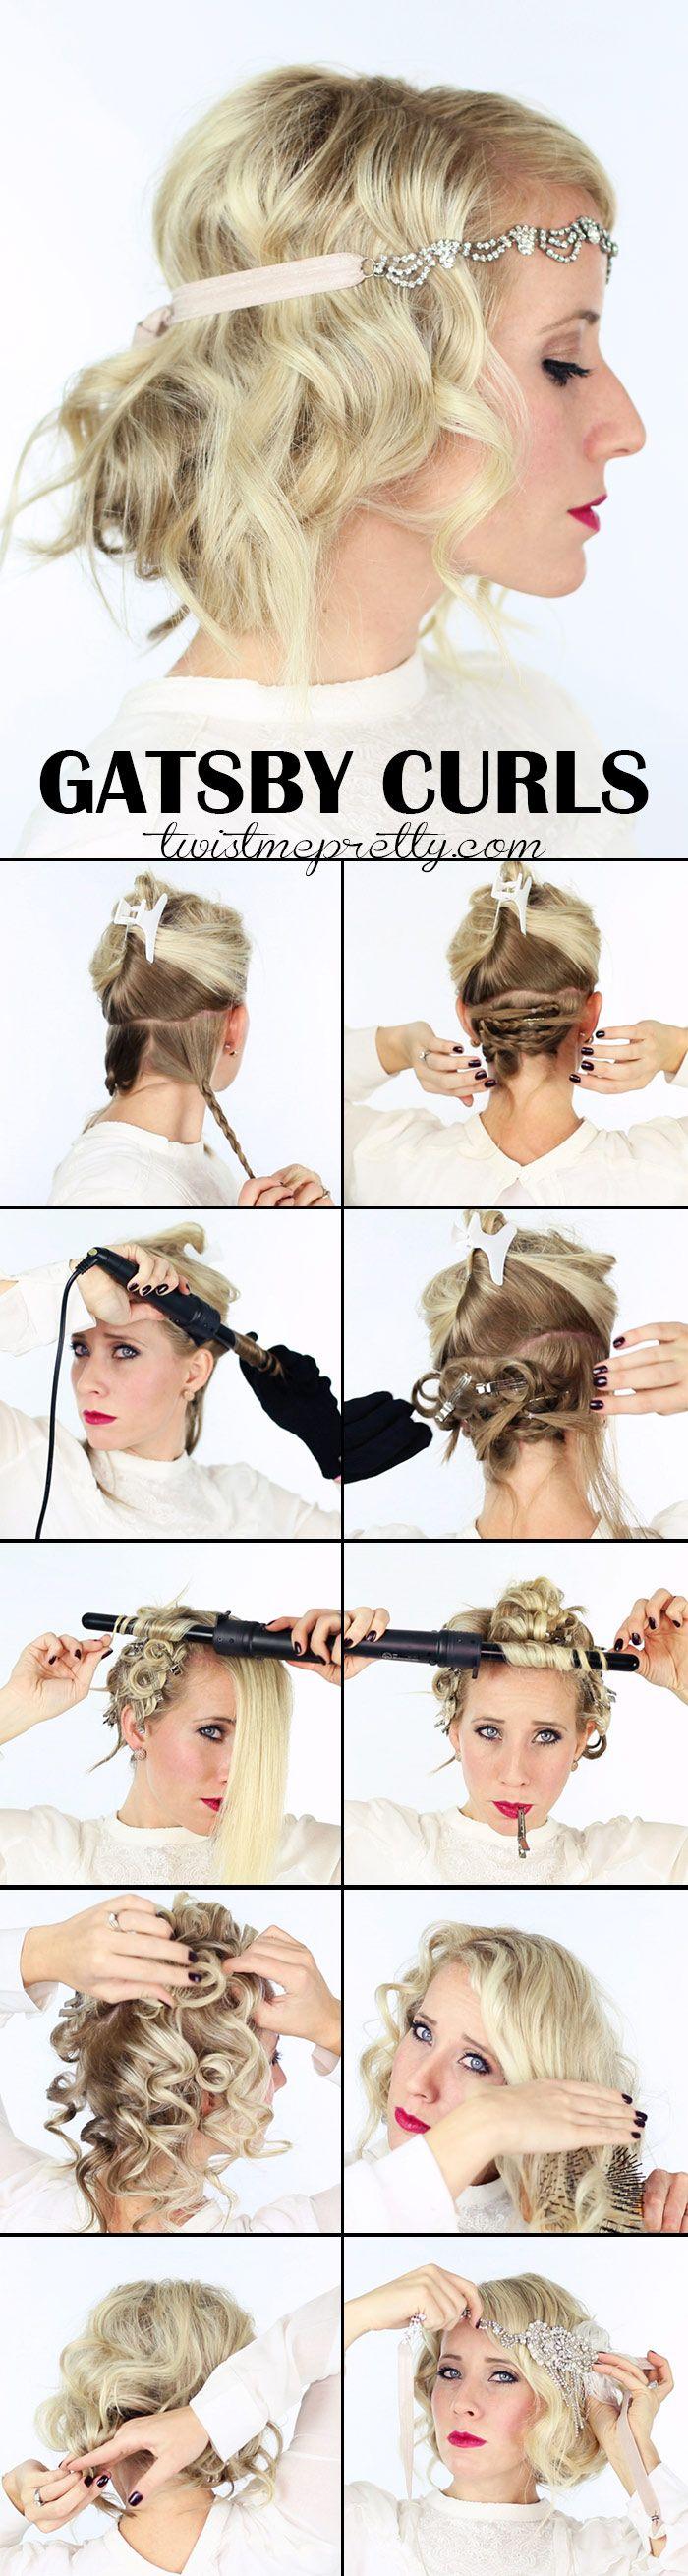 2 Gorgeous Gatsby Hairstyles For Halloween Or A Wedding Twist Me Pretty Vintage Wedding Hair Hair Styles Vintage Hairstyles